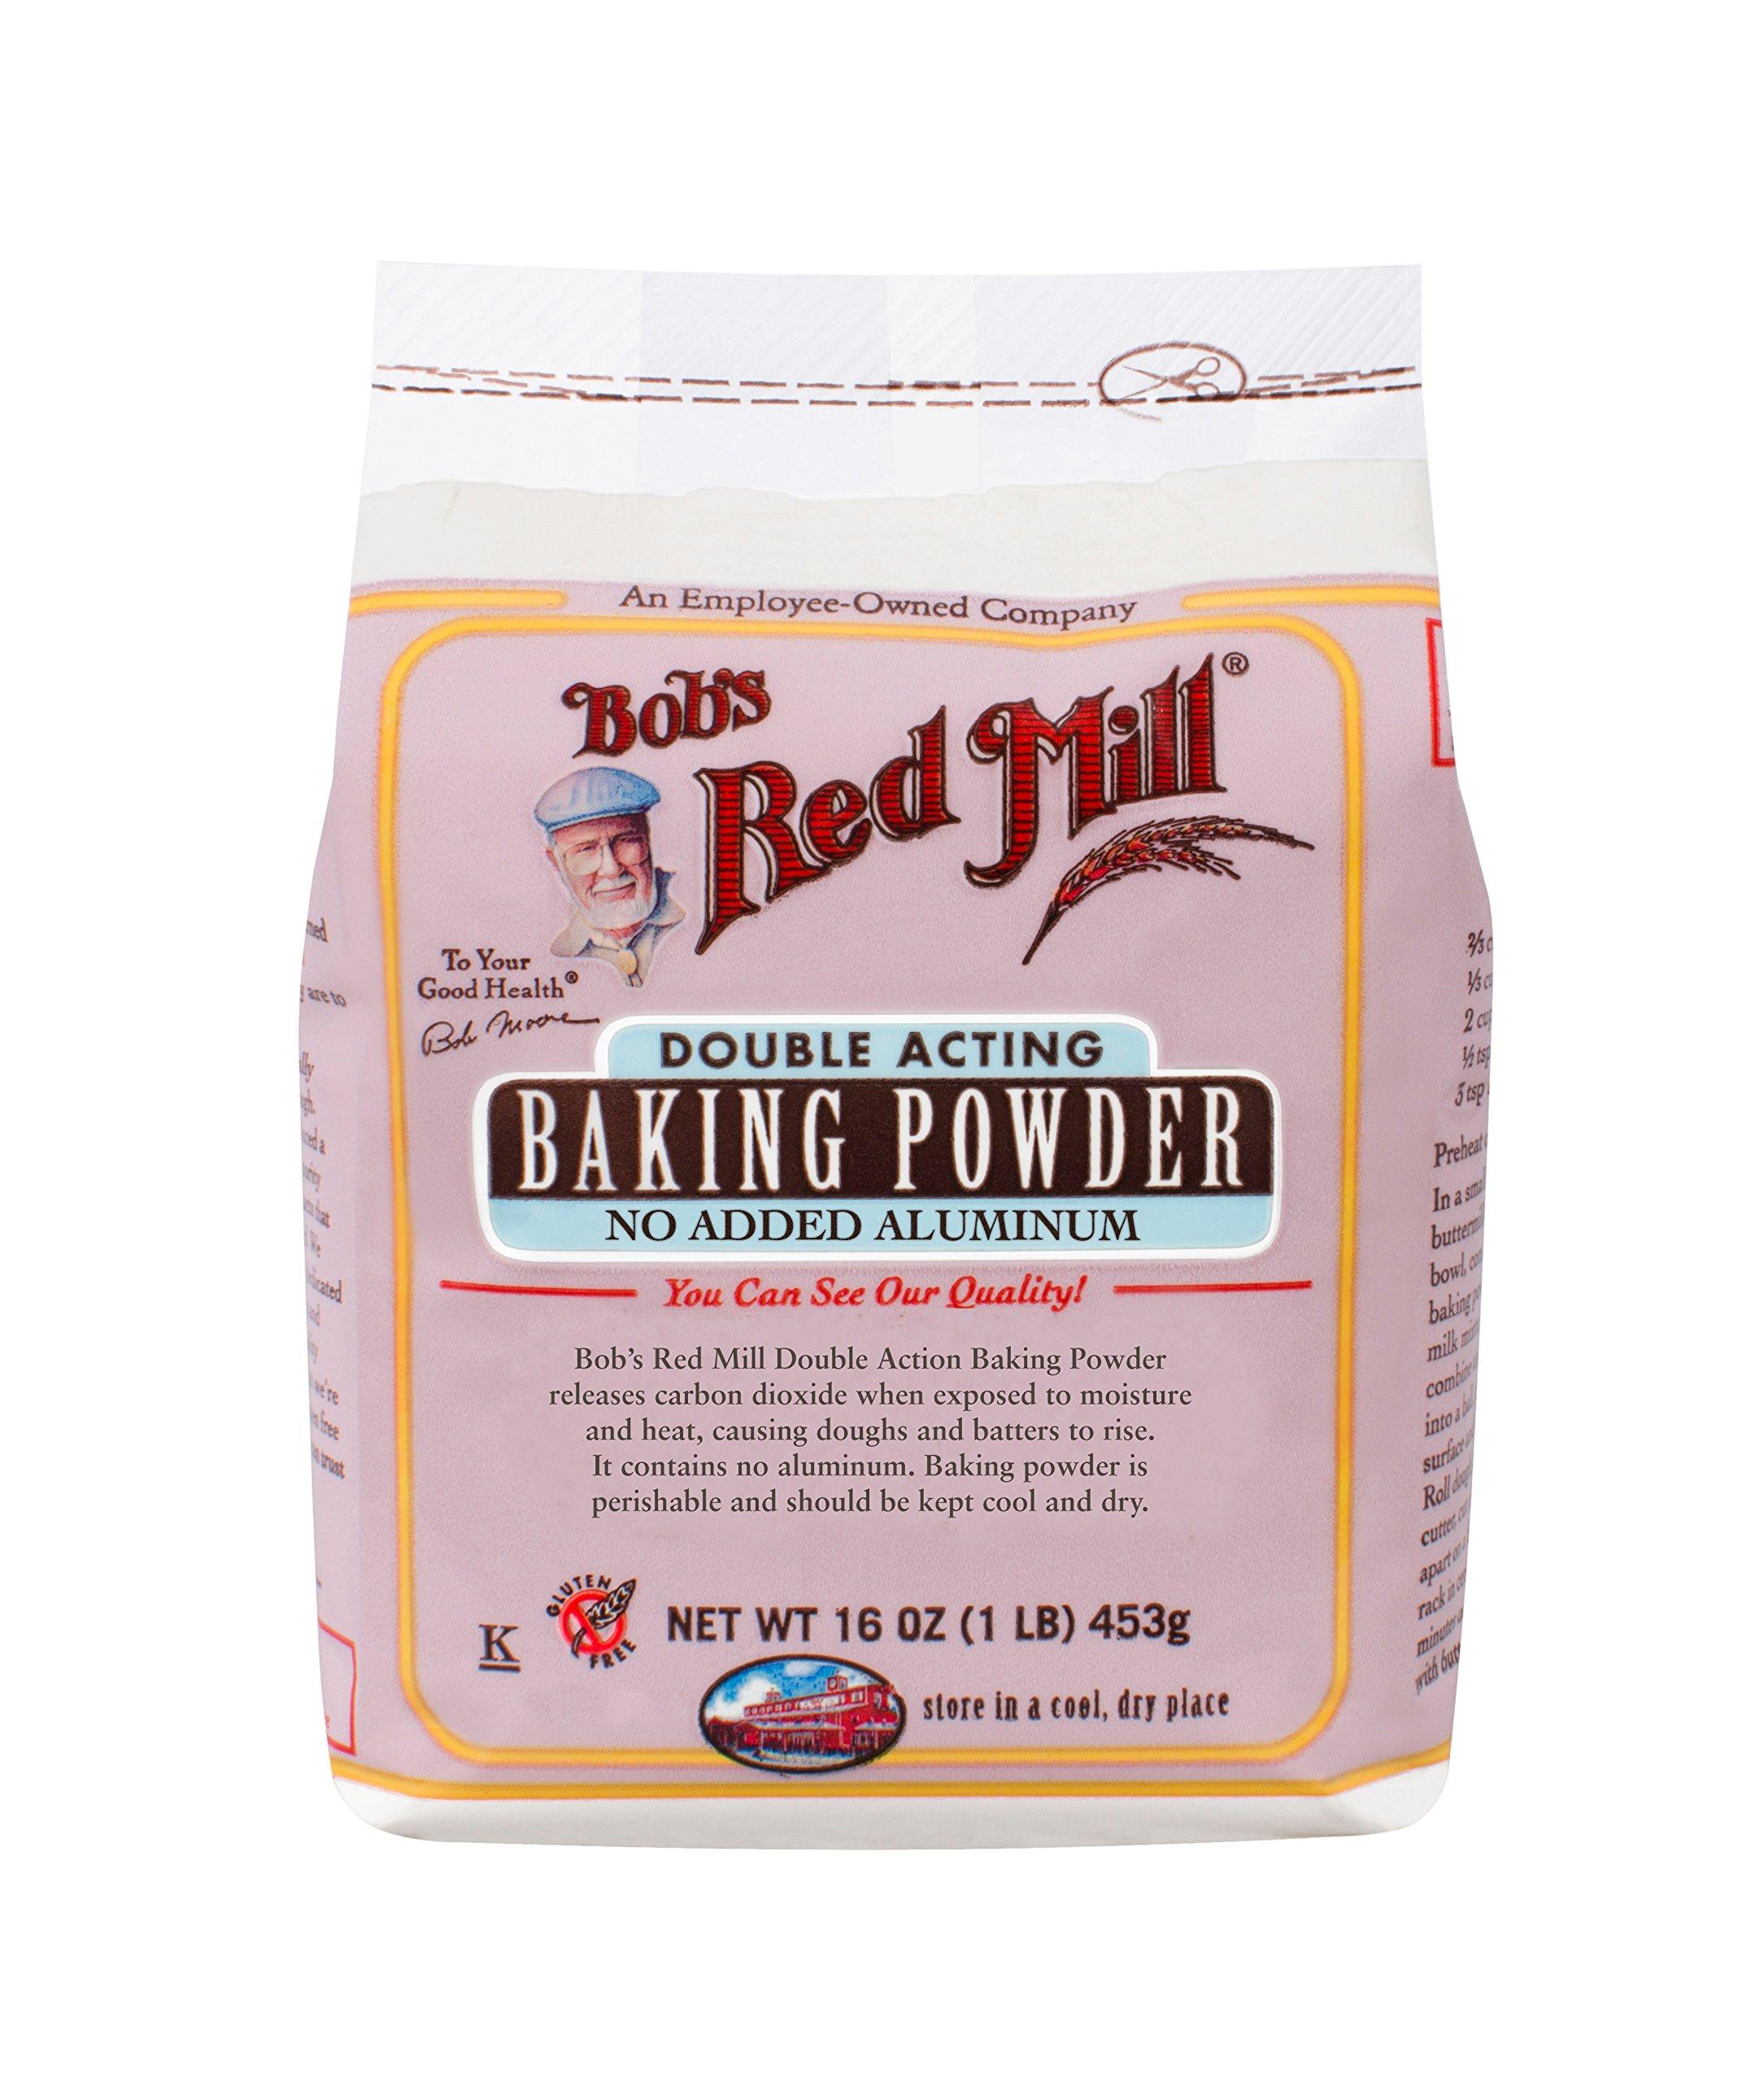 Bob's Red Mill Baking Powder, 16 Ounce